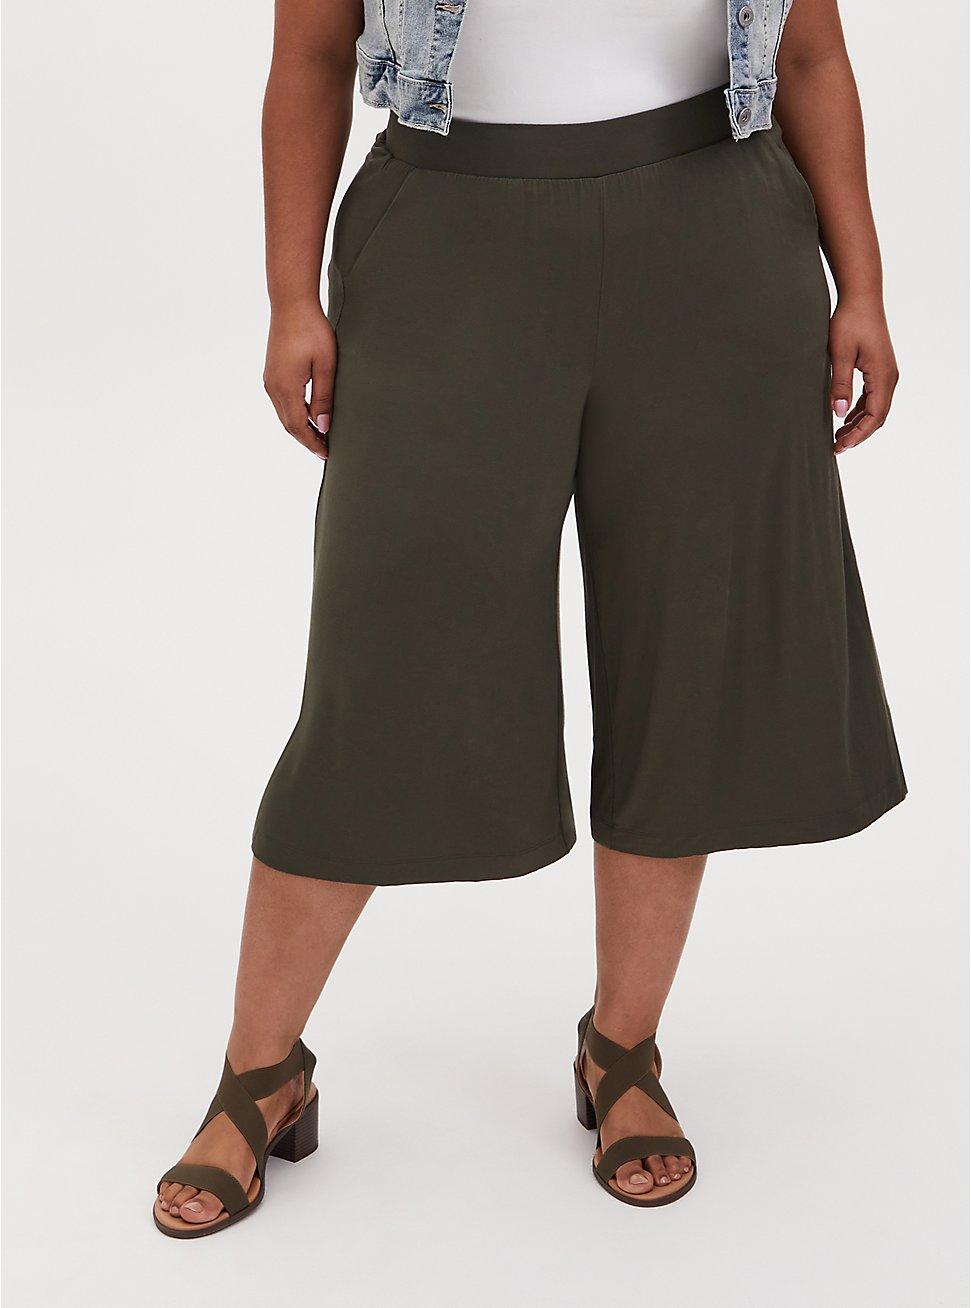 Plus Size Super Soft Olive Green Culotte Pant, DEEP DEPTHS, hi-res